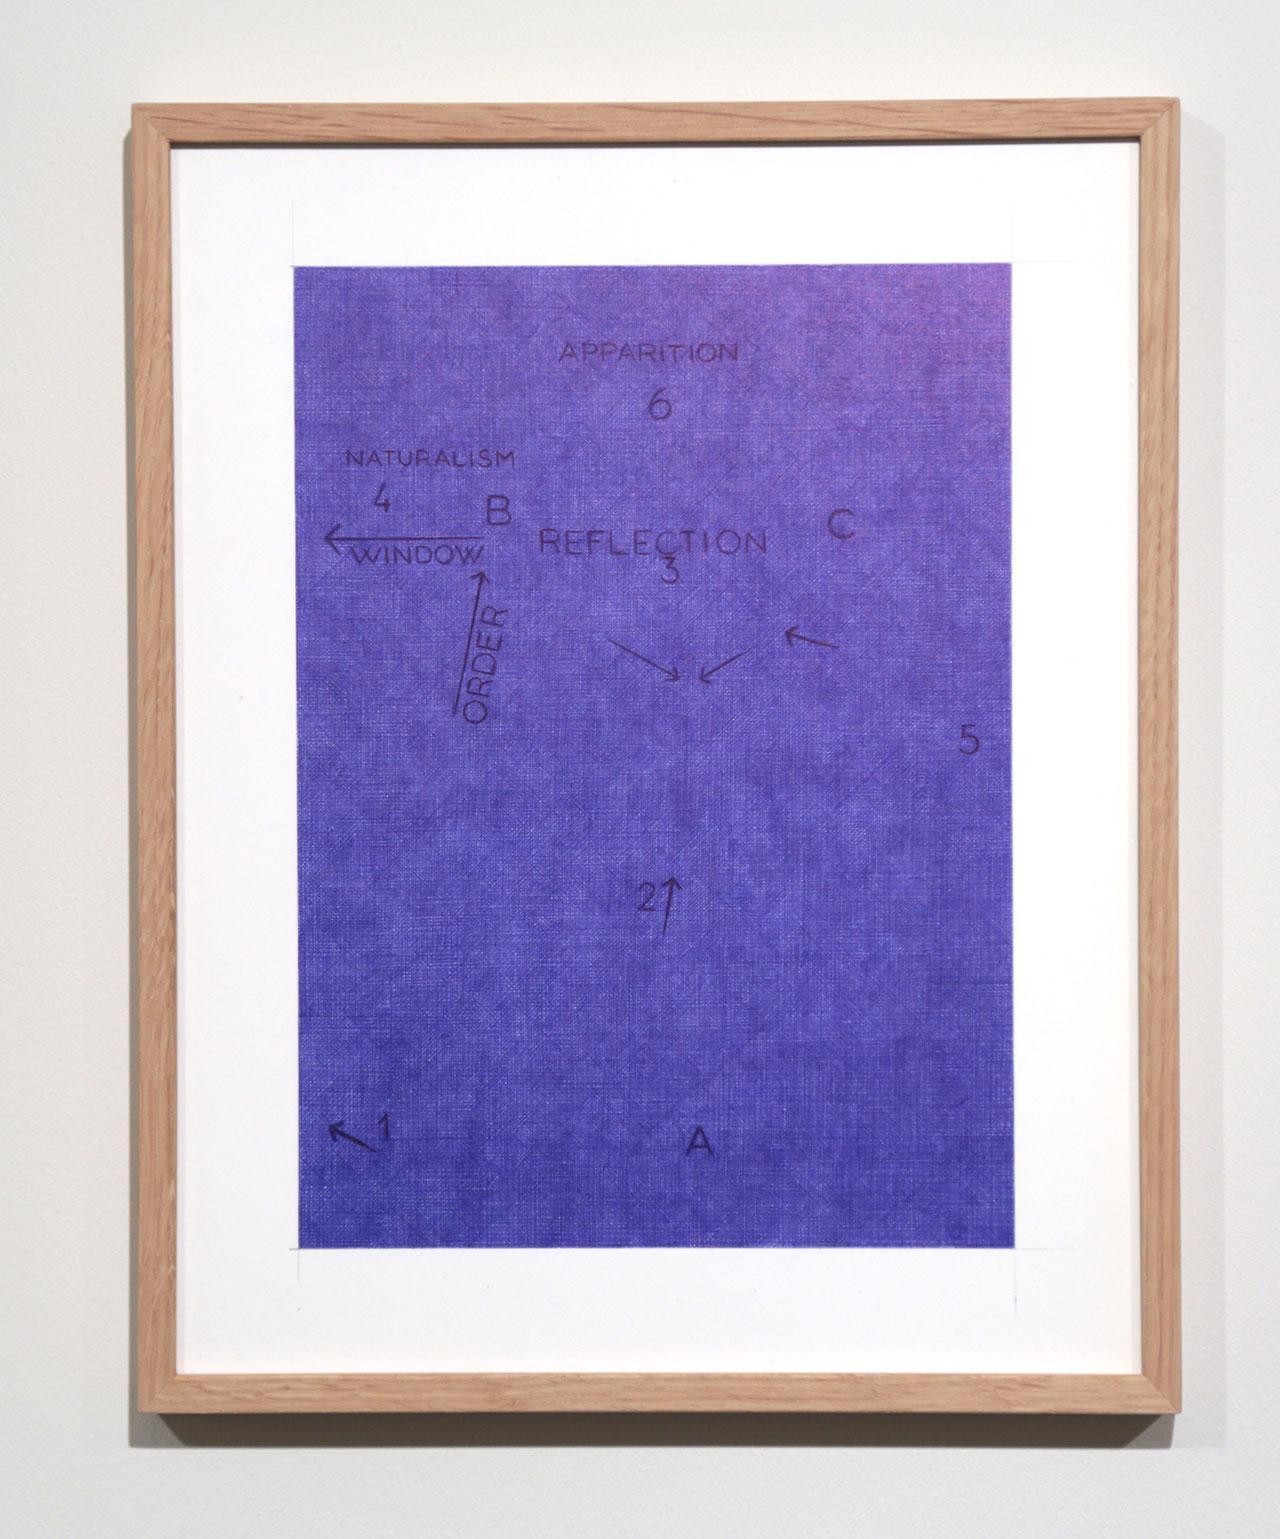 Giuseppe Stampone,Tentative Ecouchee d'une peinture utopiste(detail), 2016;bic pen on paper (particular)©Giuseppe Stampone,MLF | Marie-Laure Fleisch Gallery.